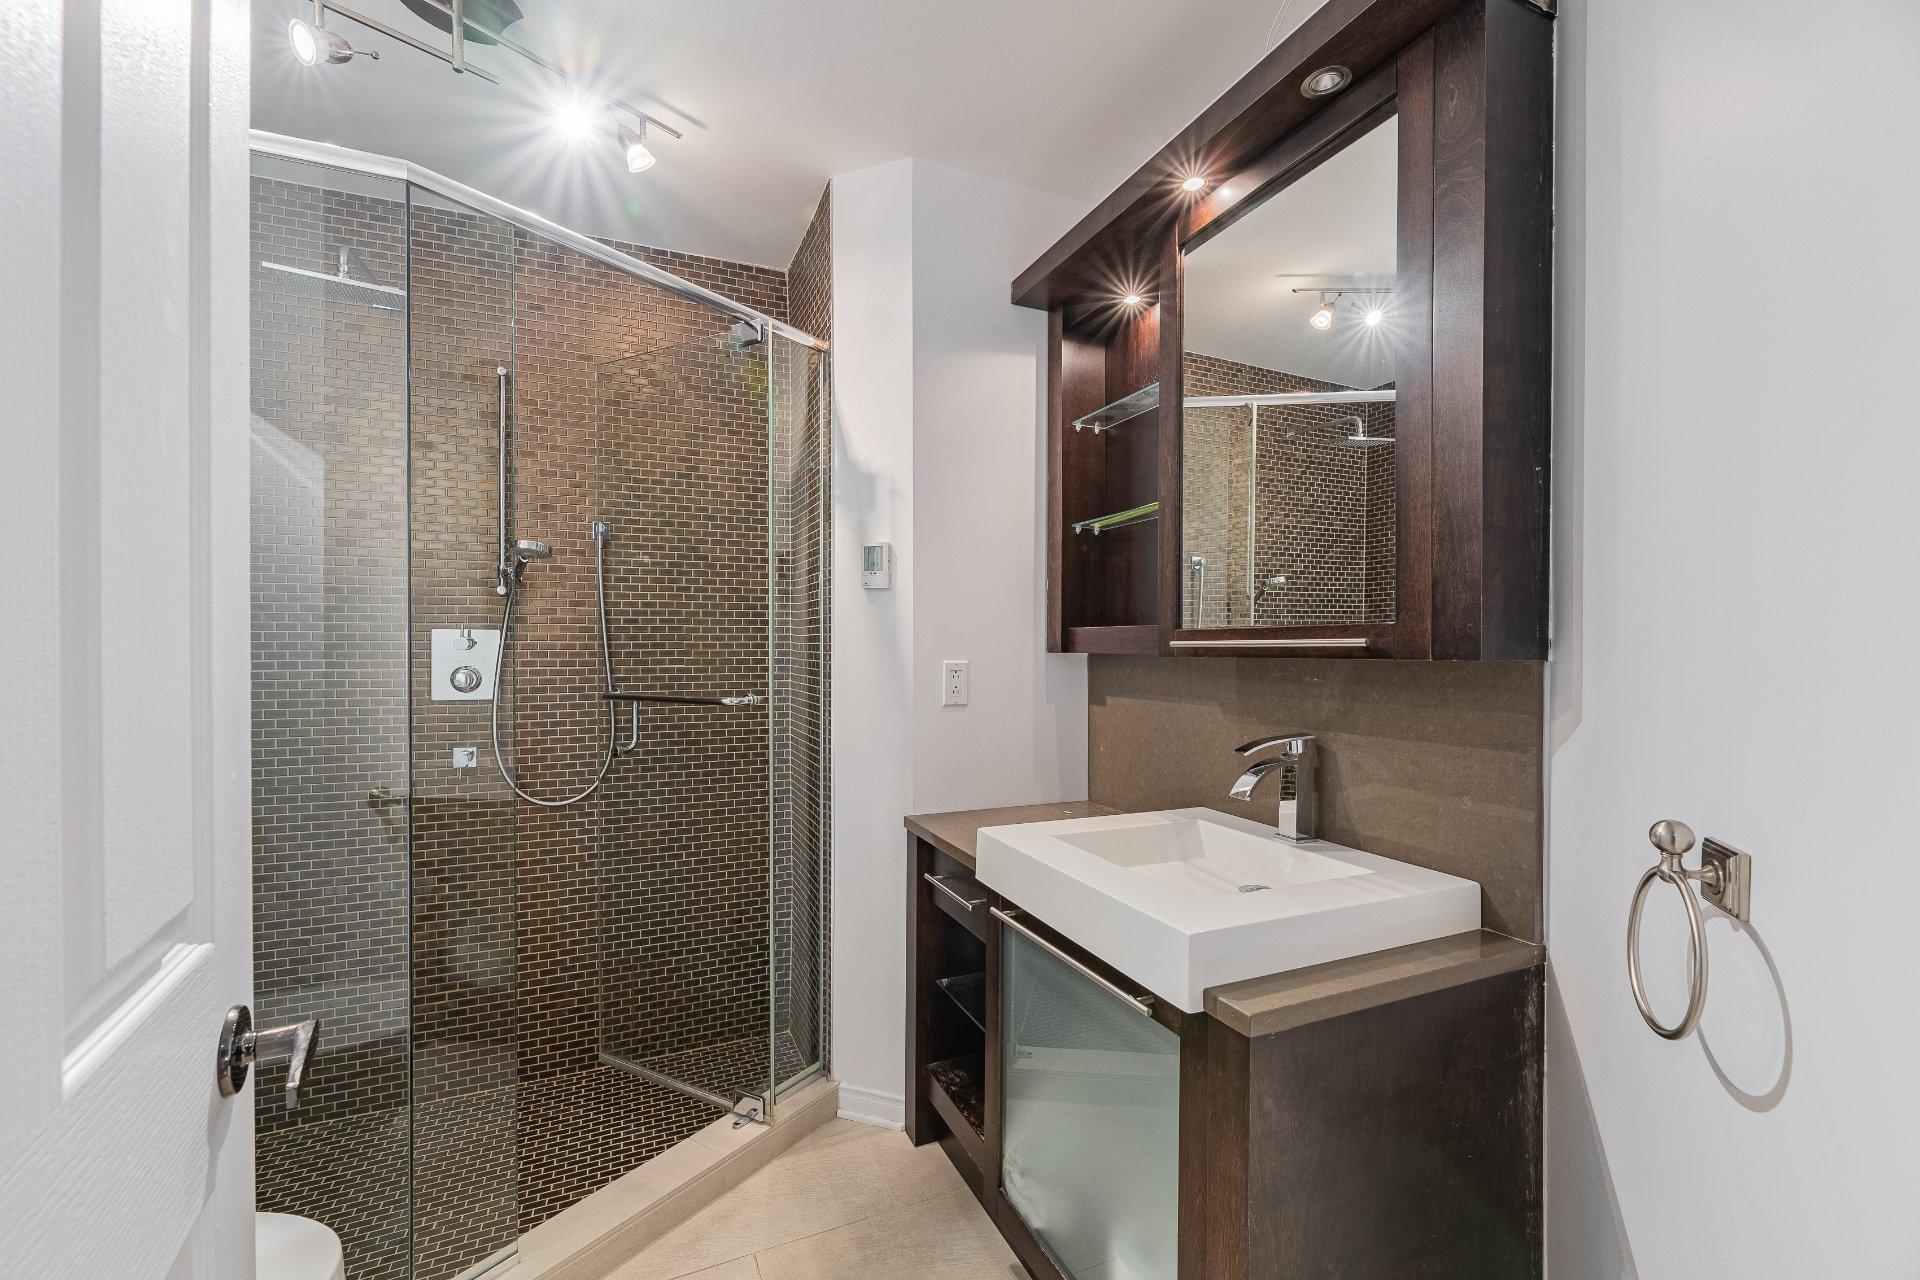 Bathroom Condo Longueuil (Le Vieux-Longueuil)